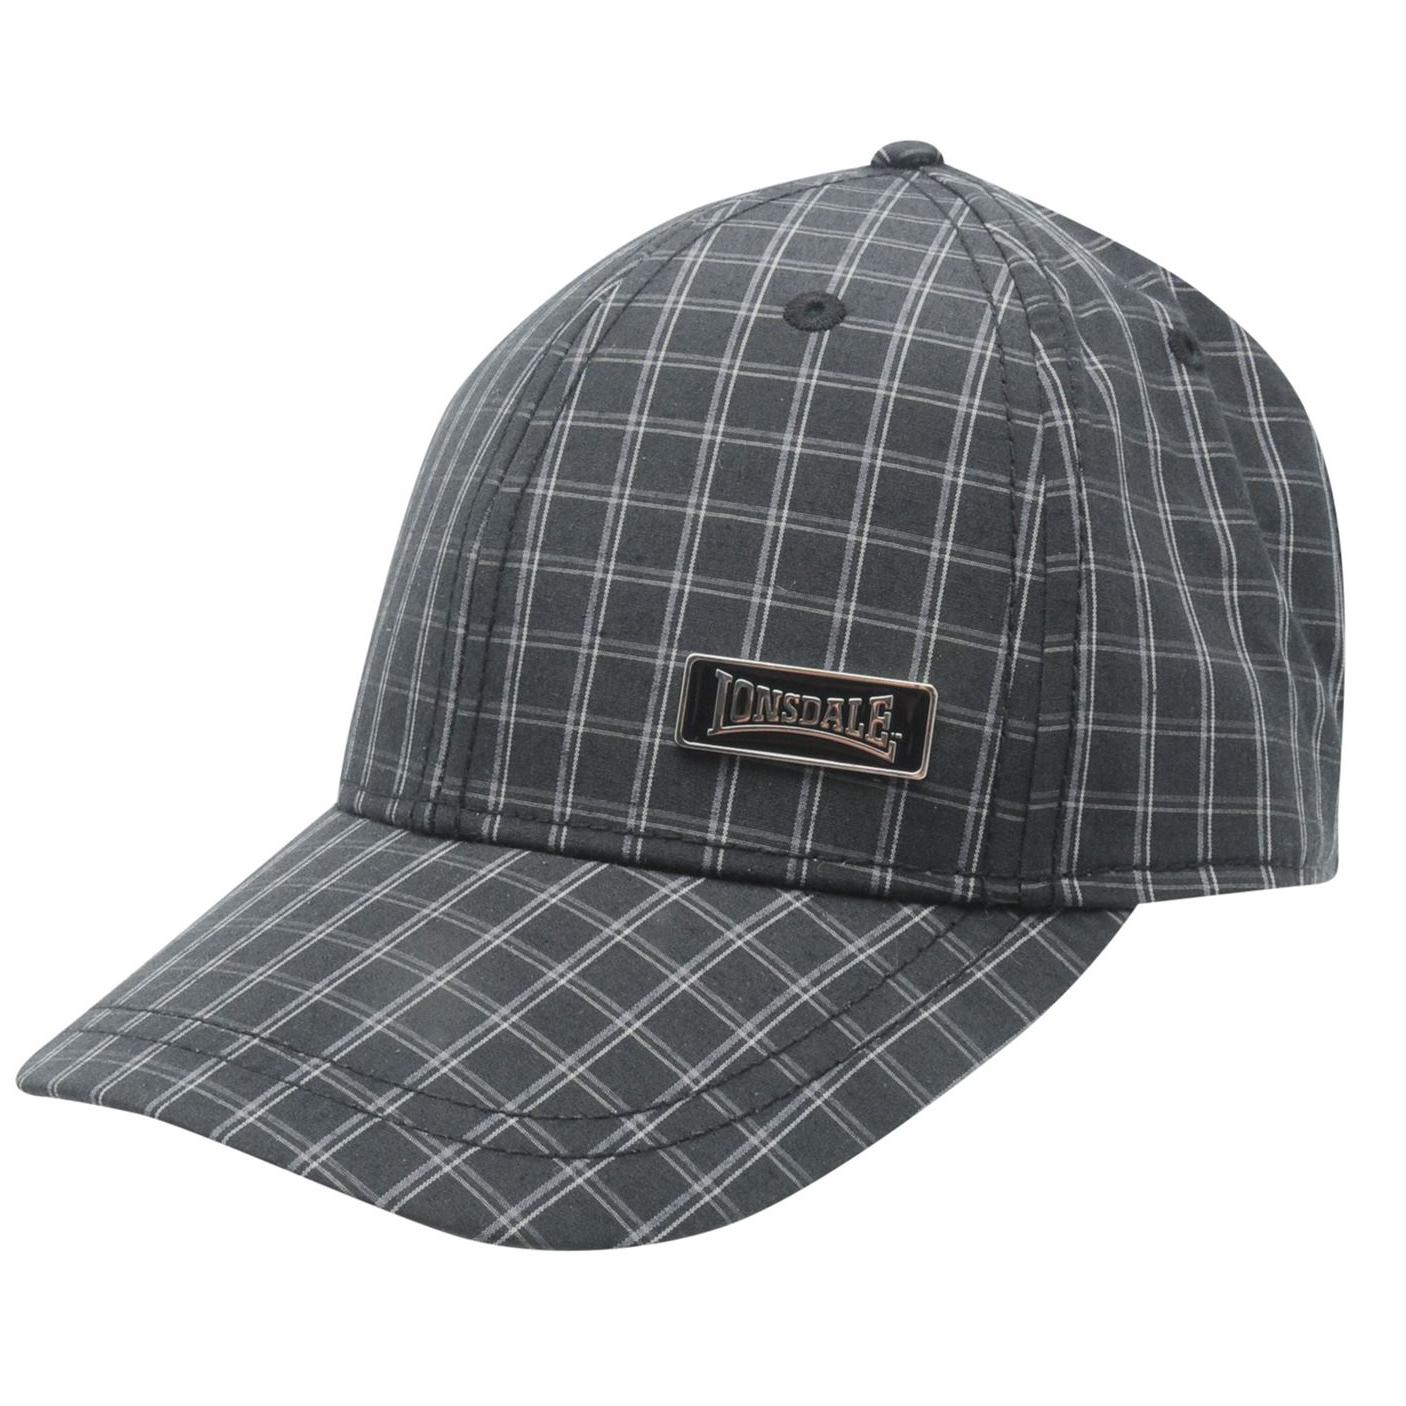 Lonsdale-Herren-Kappe-Bond-Classic-Regency-Cap-Base-Cap-weiss-schwarz-navy-grau